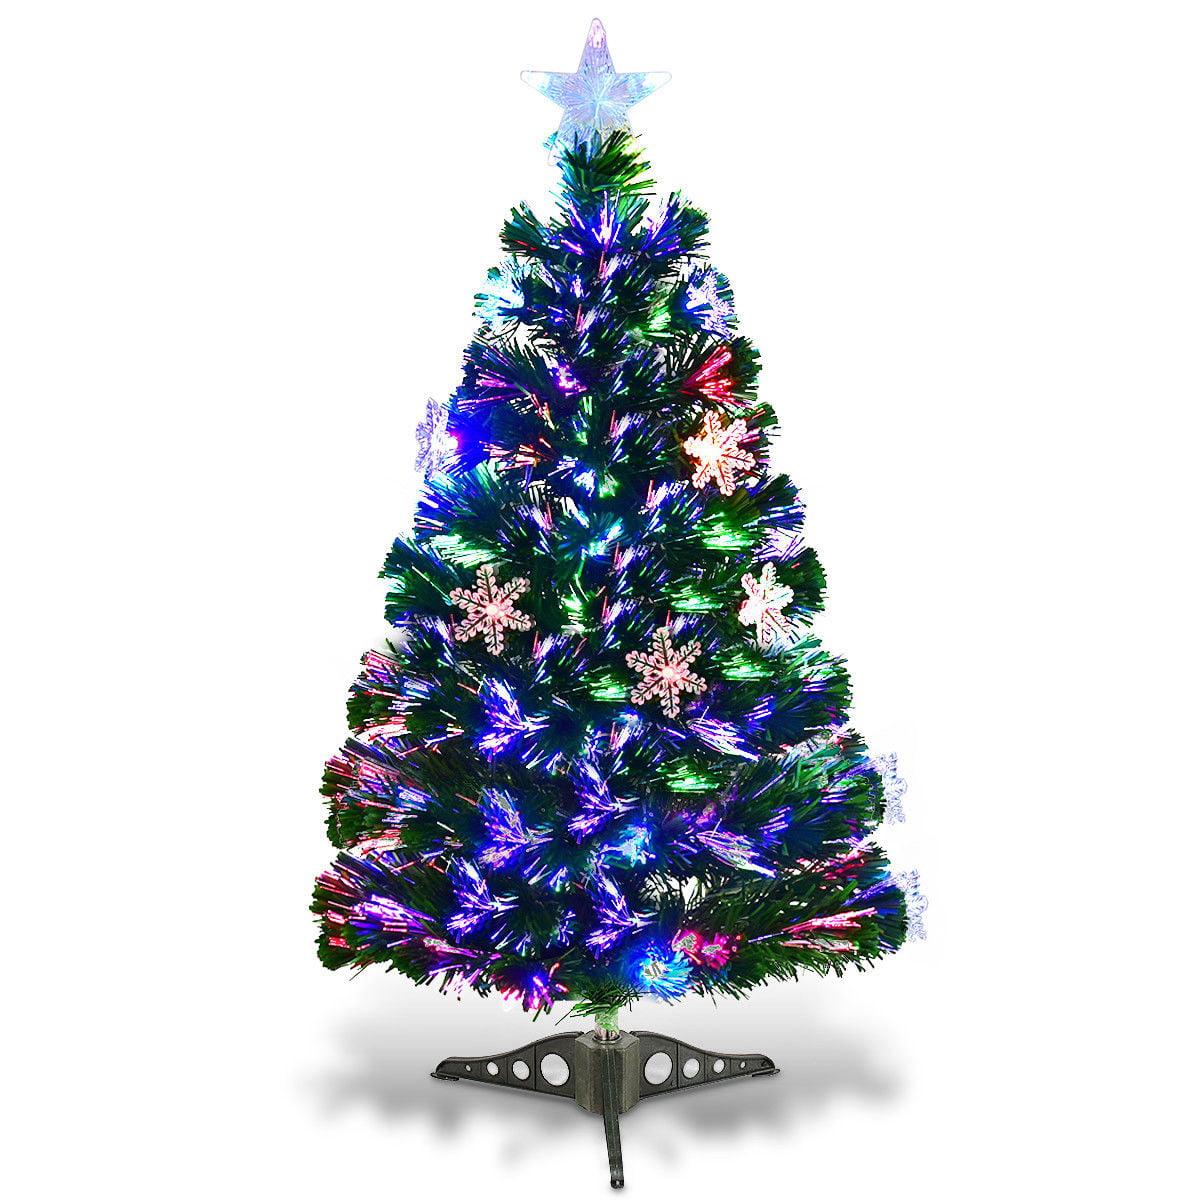 Gymax Fiber Optic 3' PVC Artificial Christmas Tree LED Lights Snowflakes Decoration